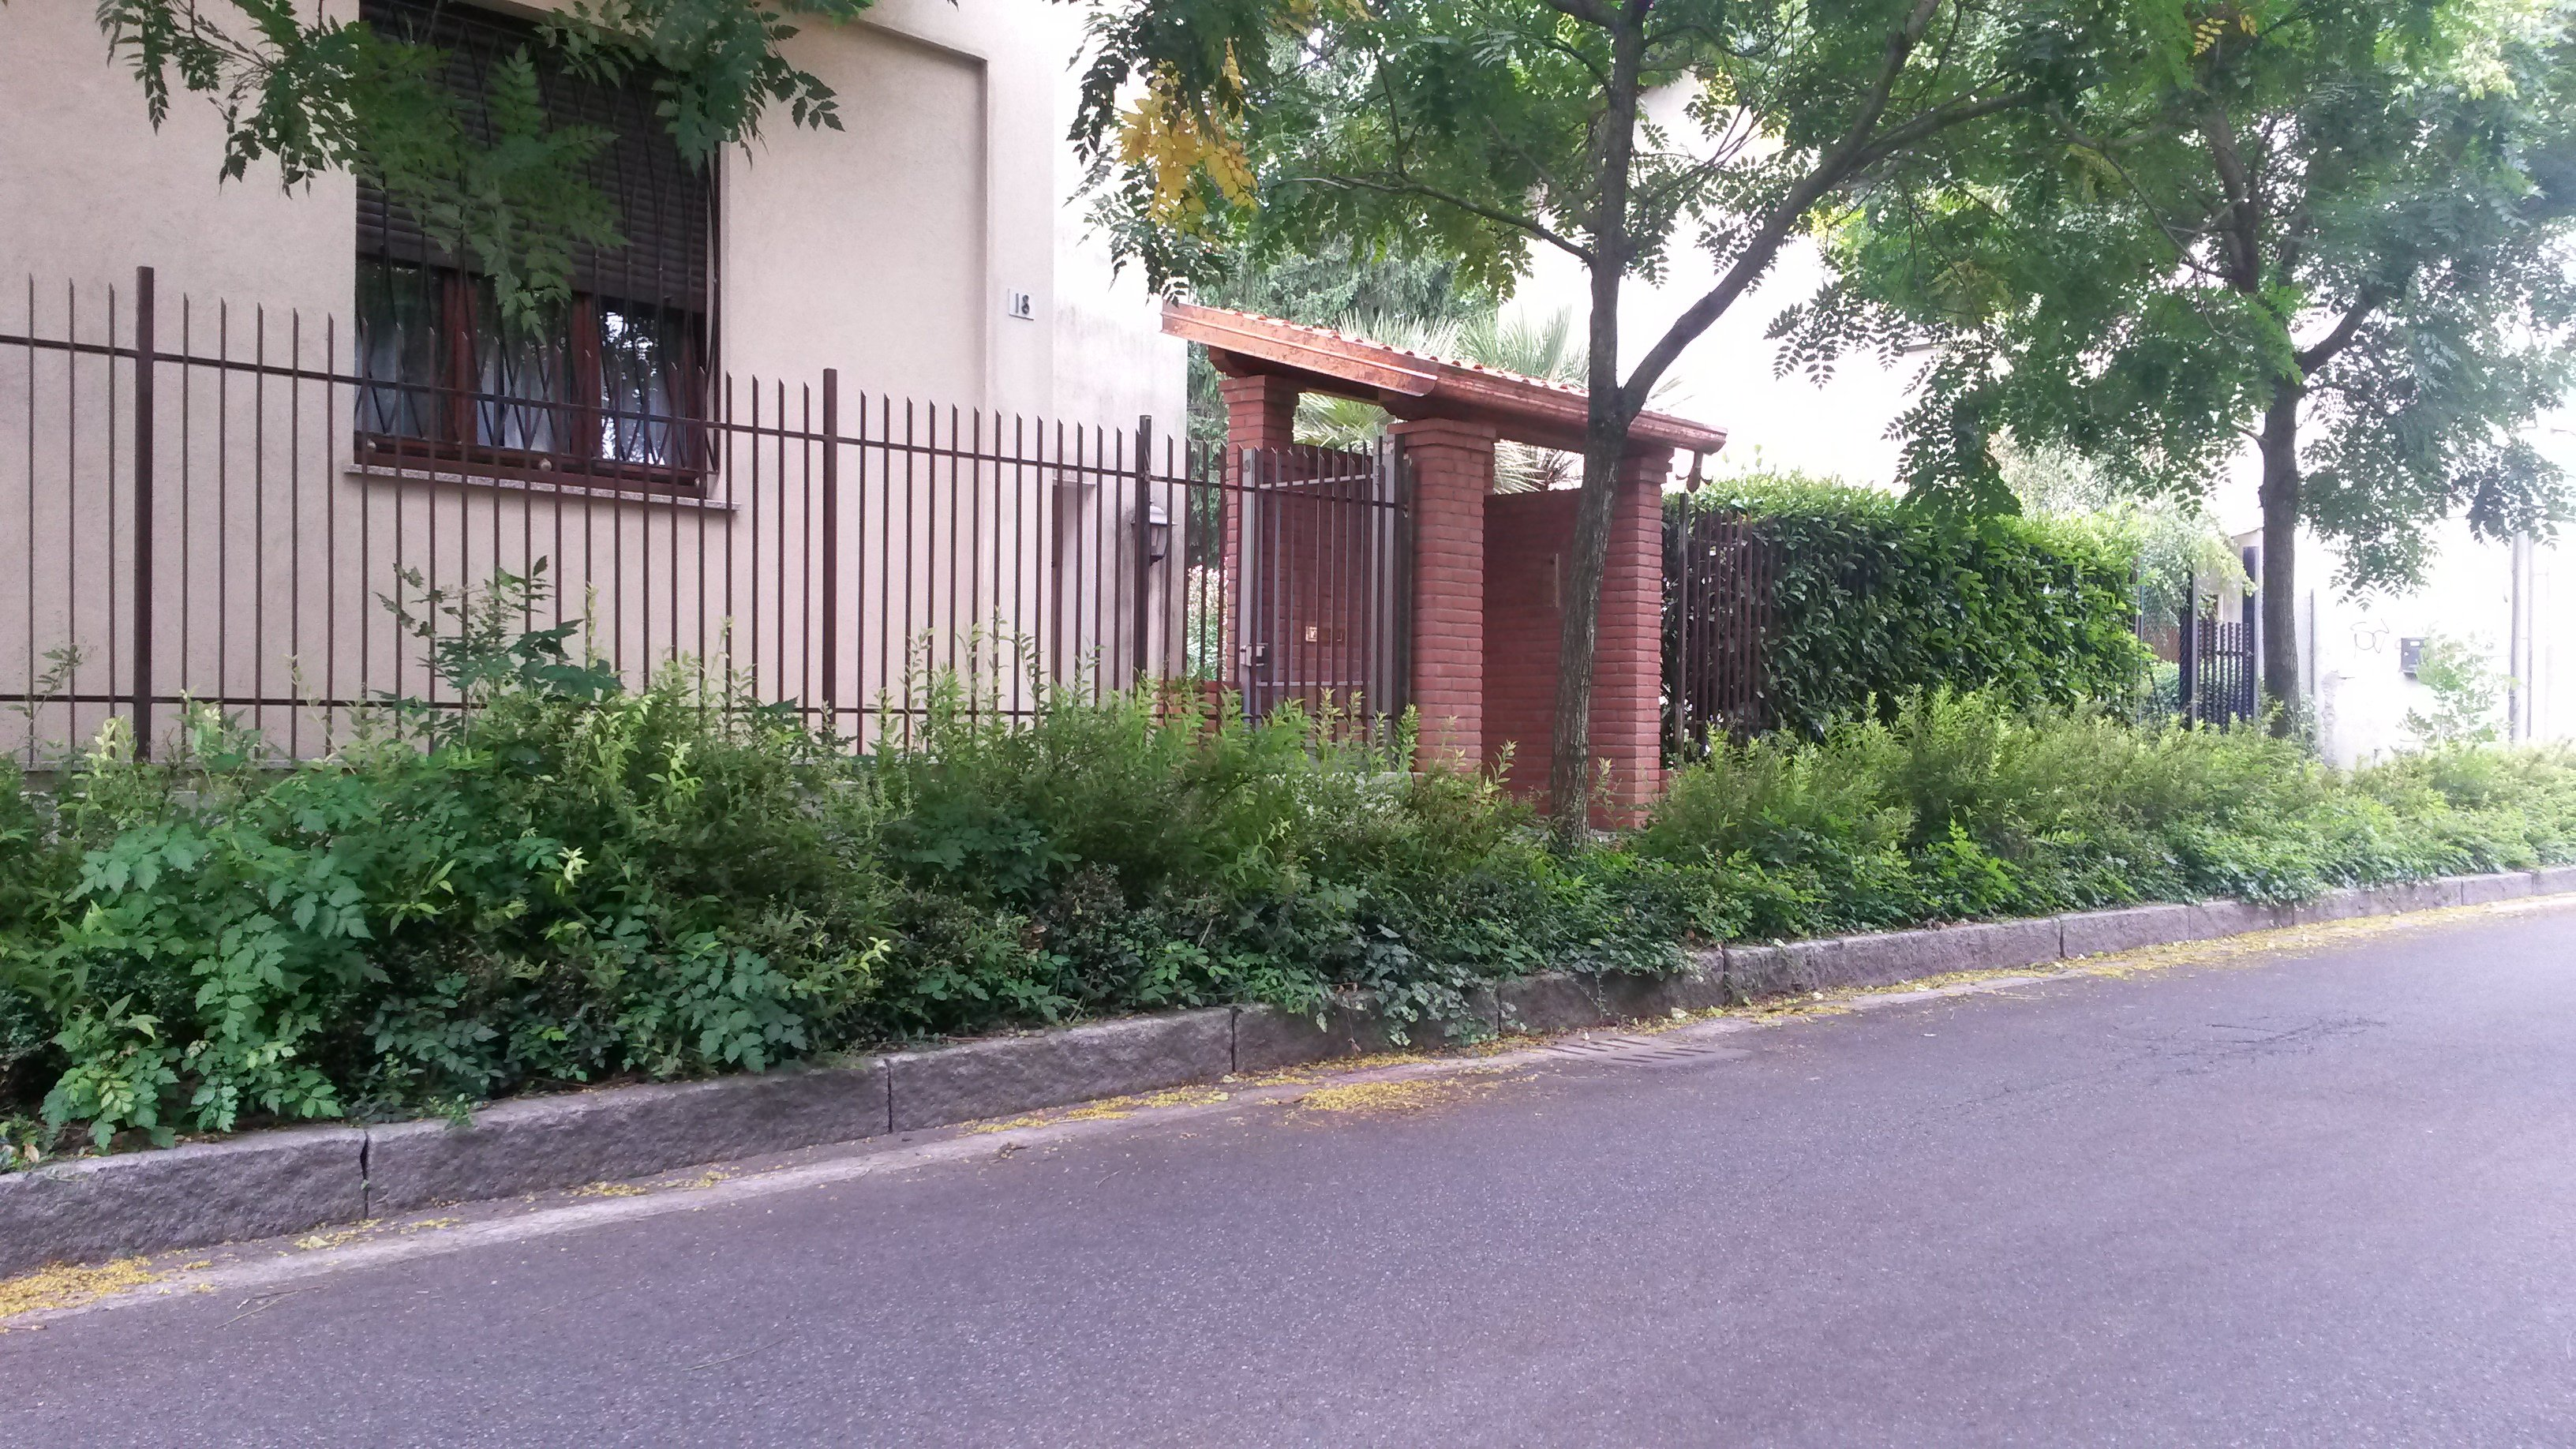 Garage da giardino e cancelli per giardino in legno - Cancelli in legno per giardino ...